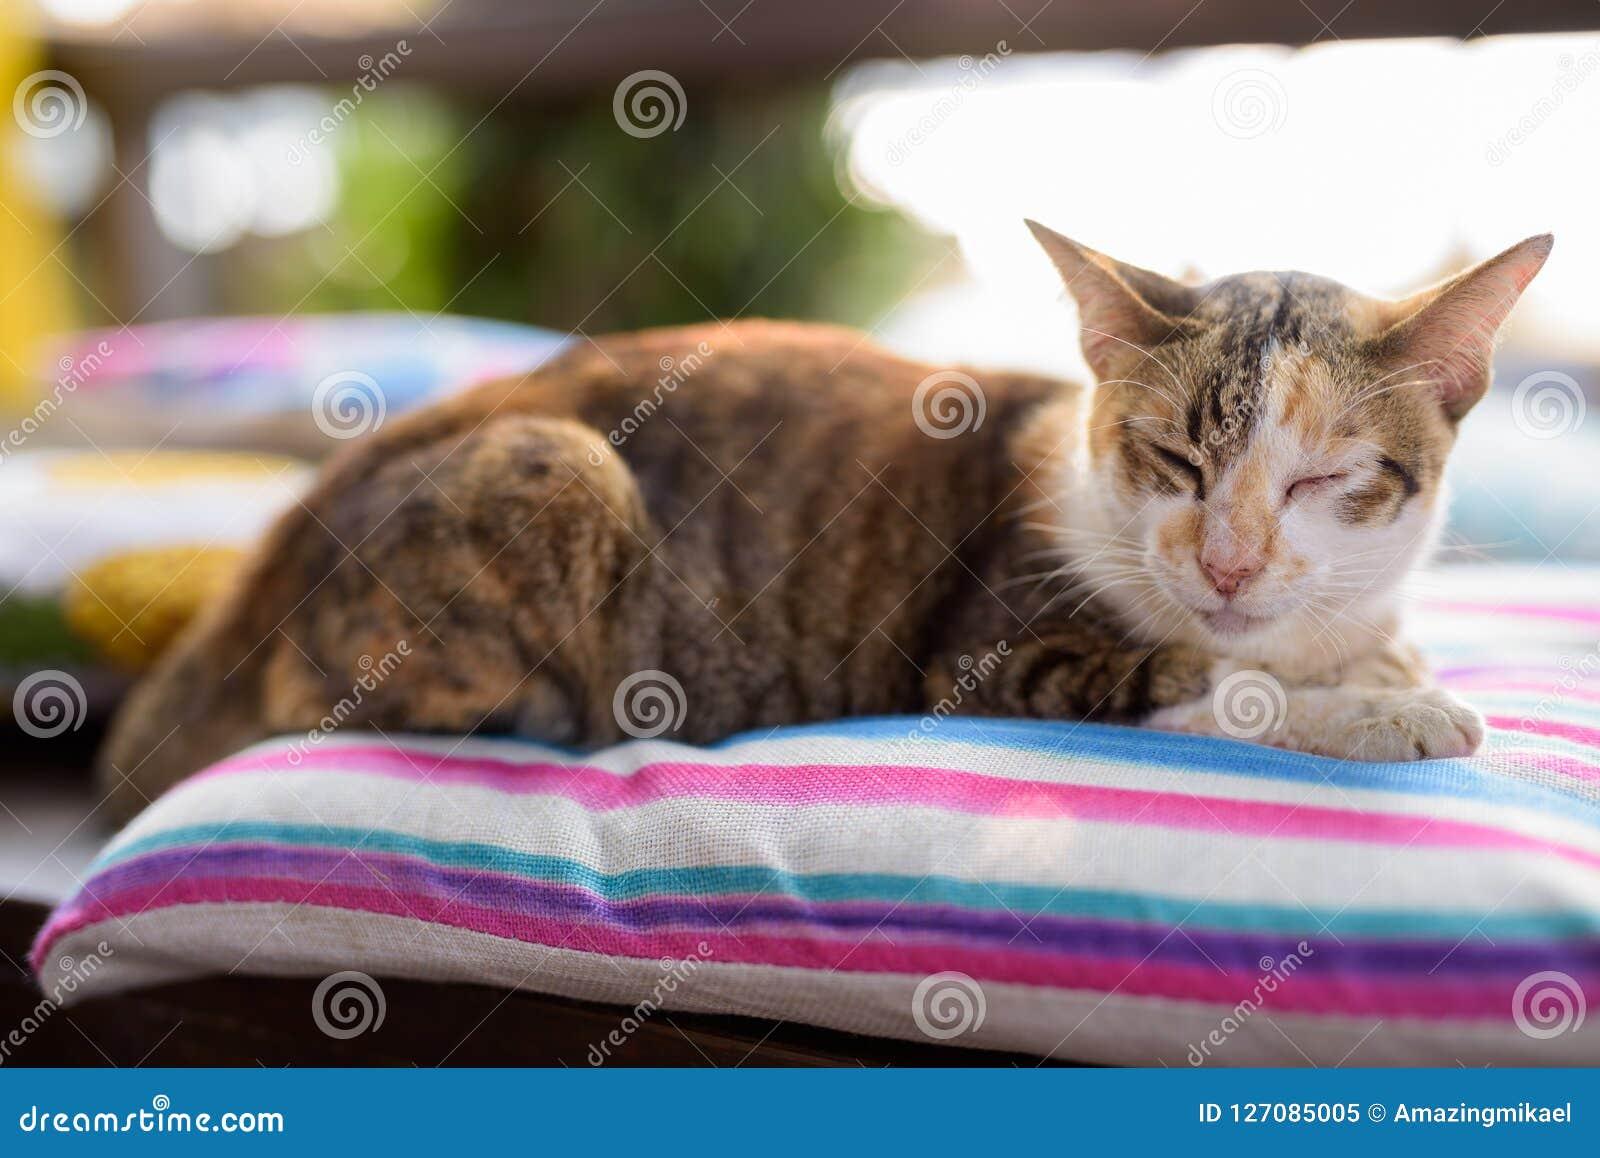 Calicó lindo Cat Sleeping On The Cushion